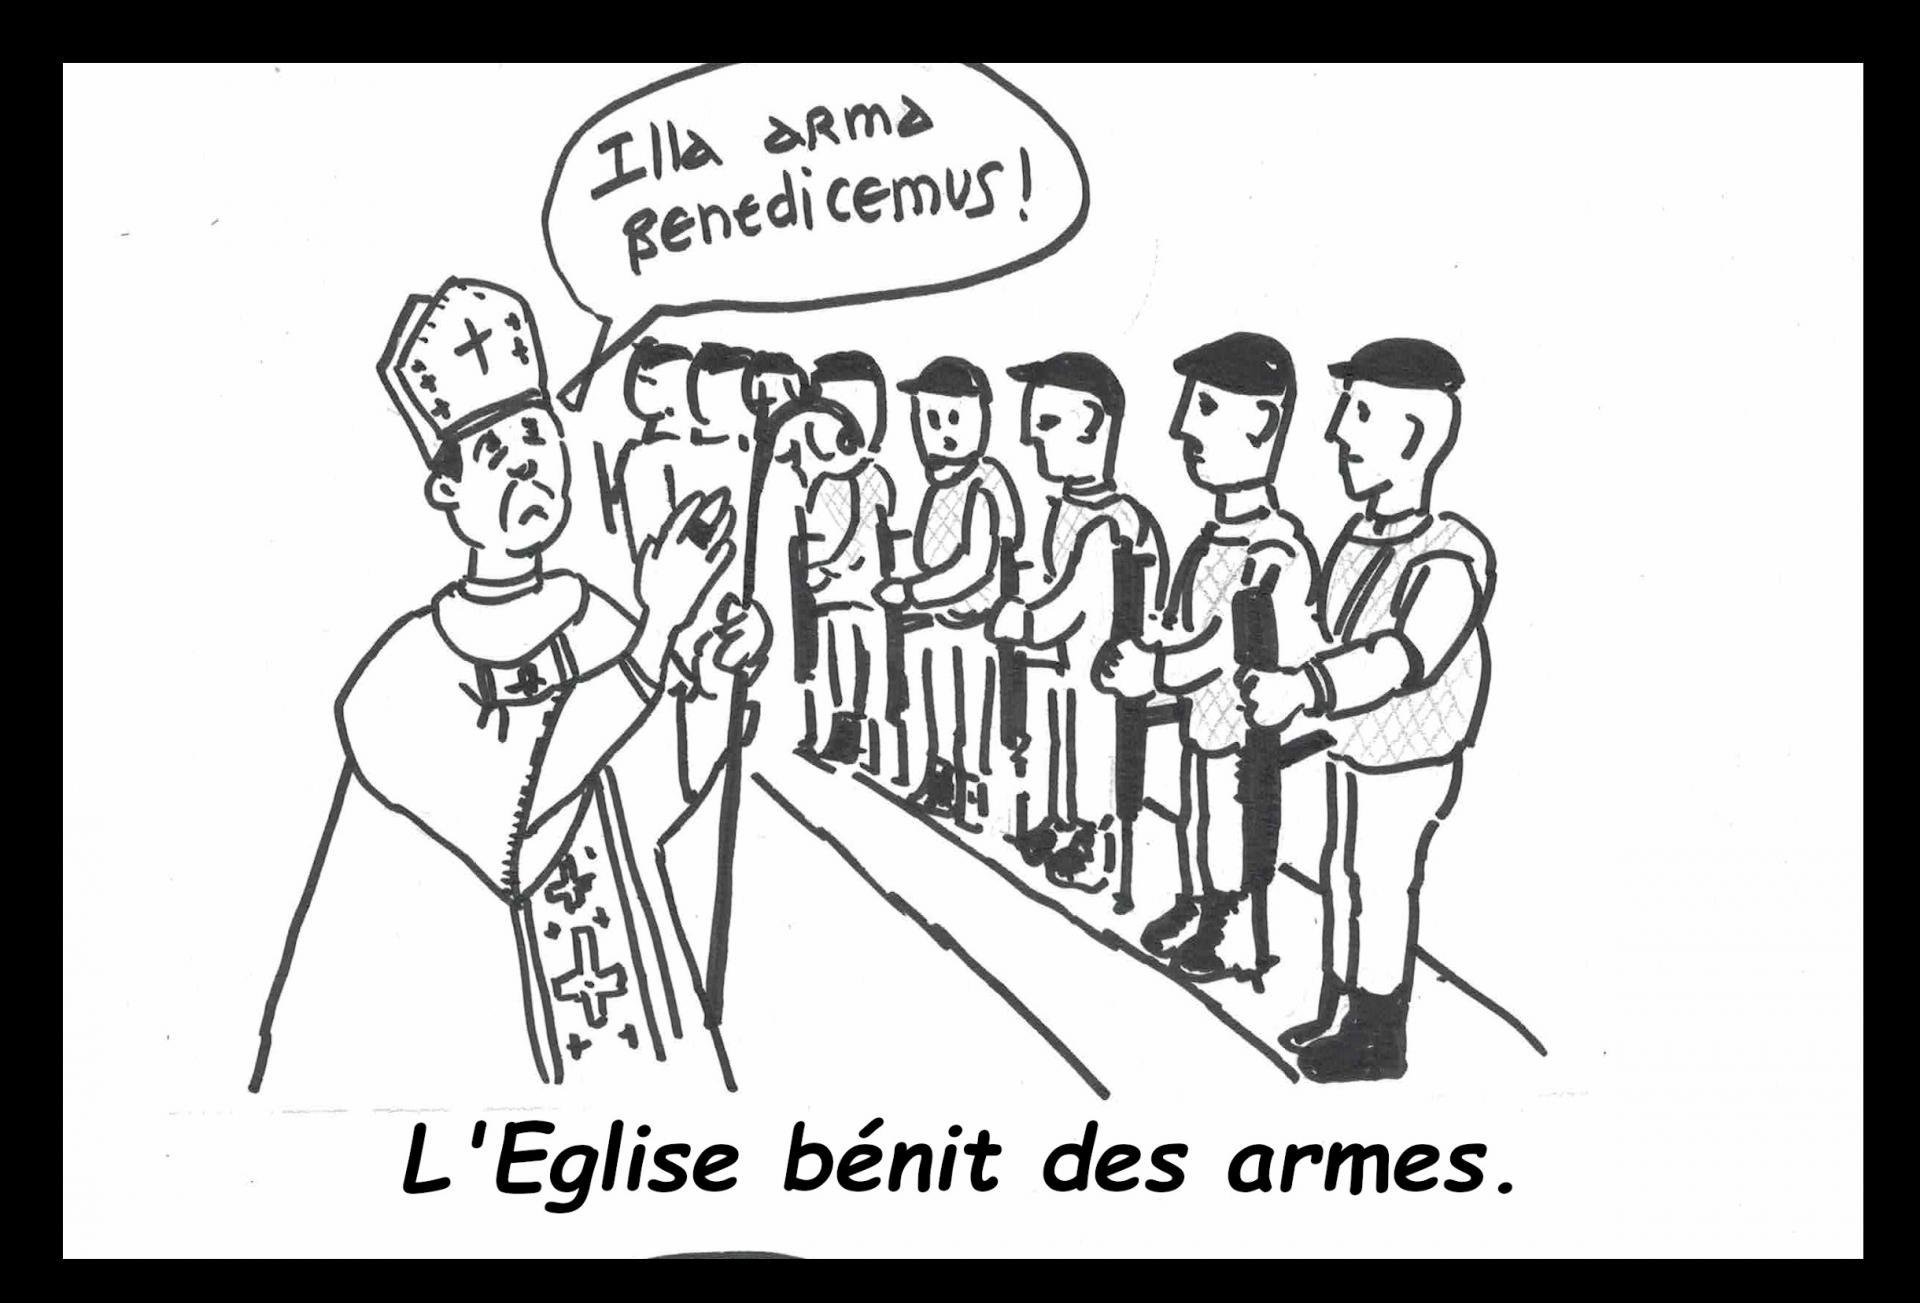 Benediction armes entourees